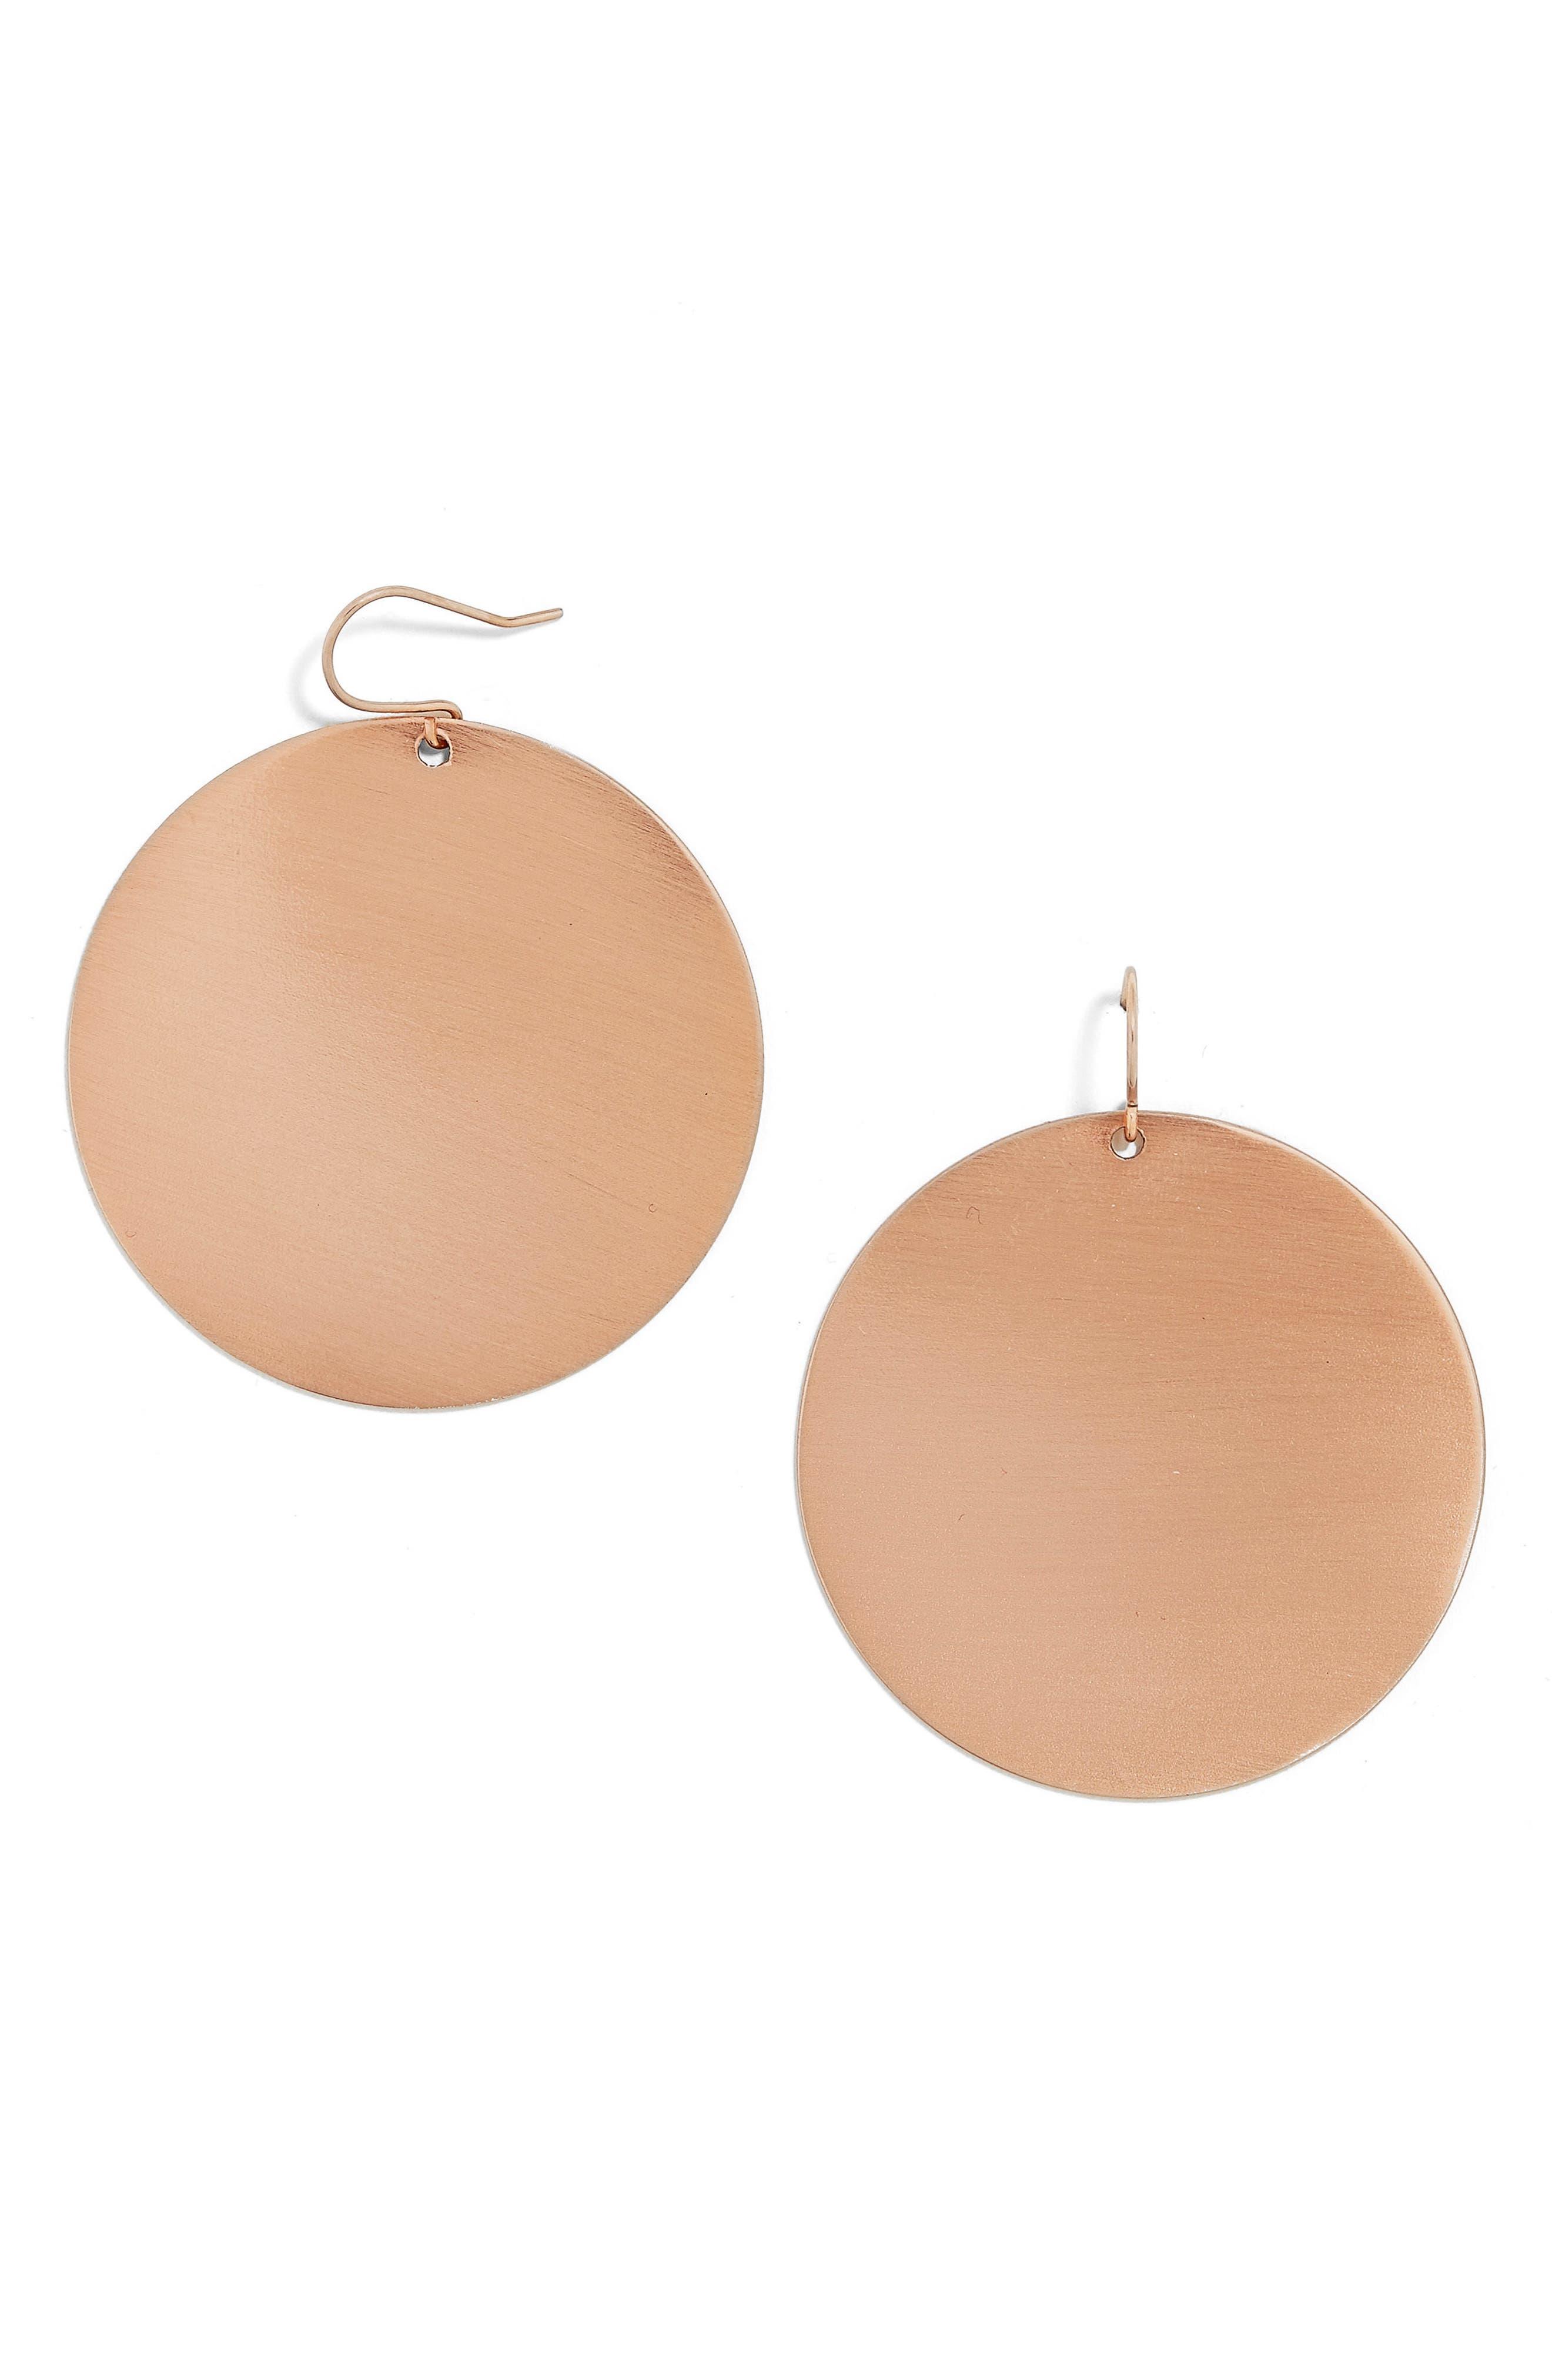 BAUBLEBAR Disc Earrings